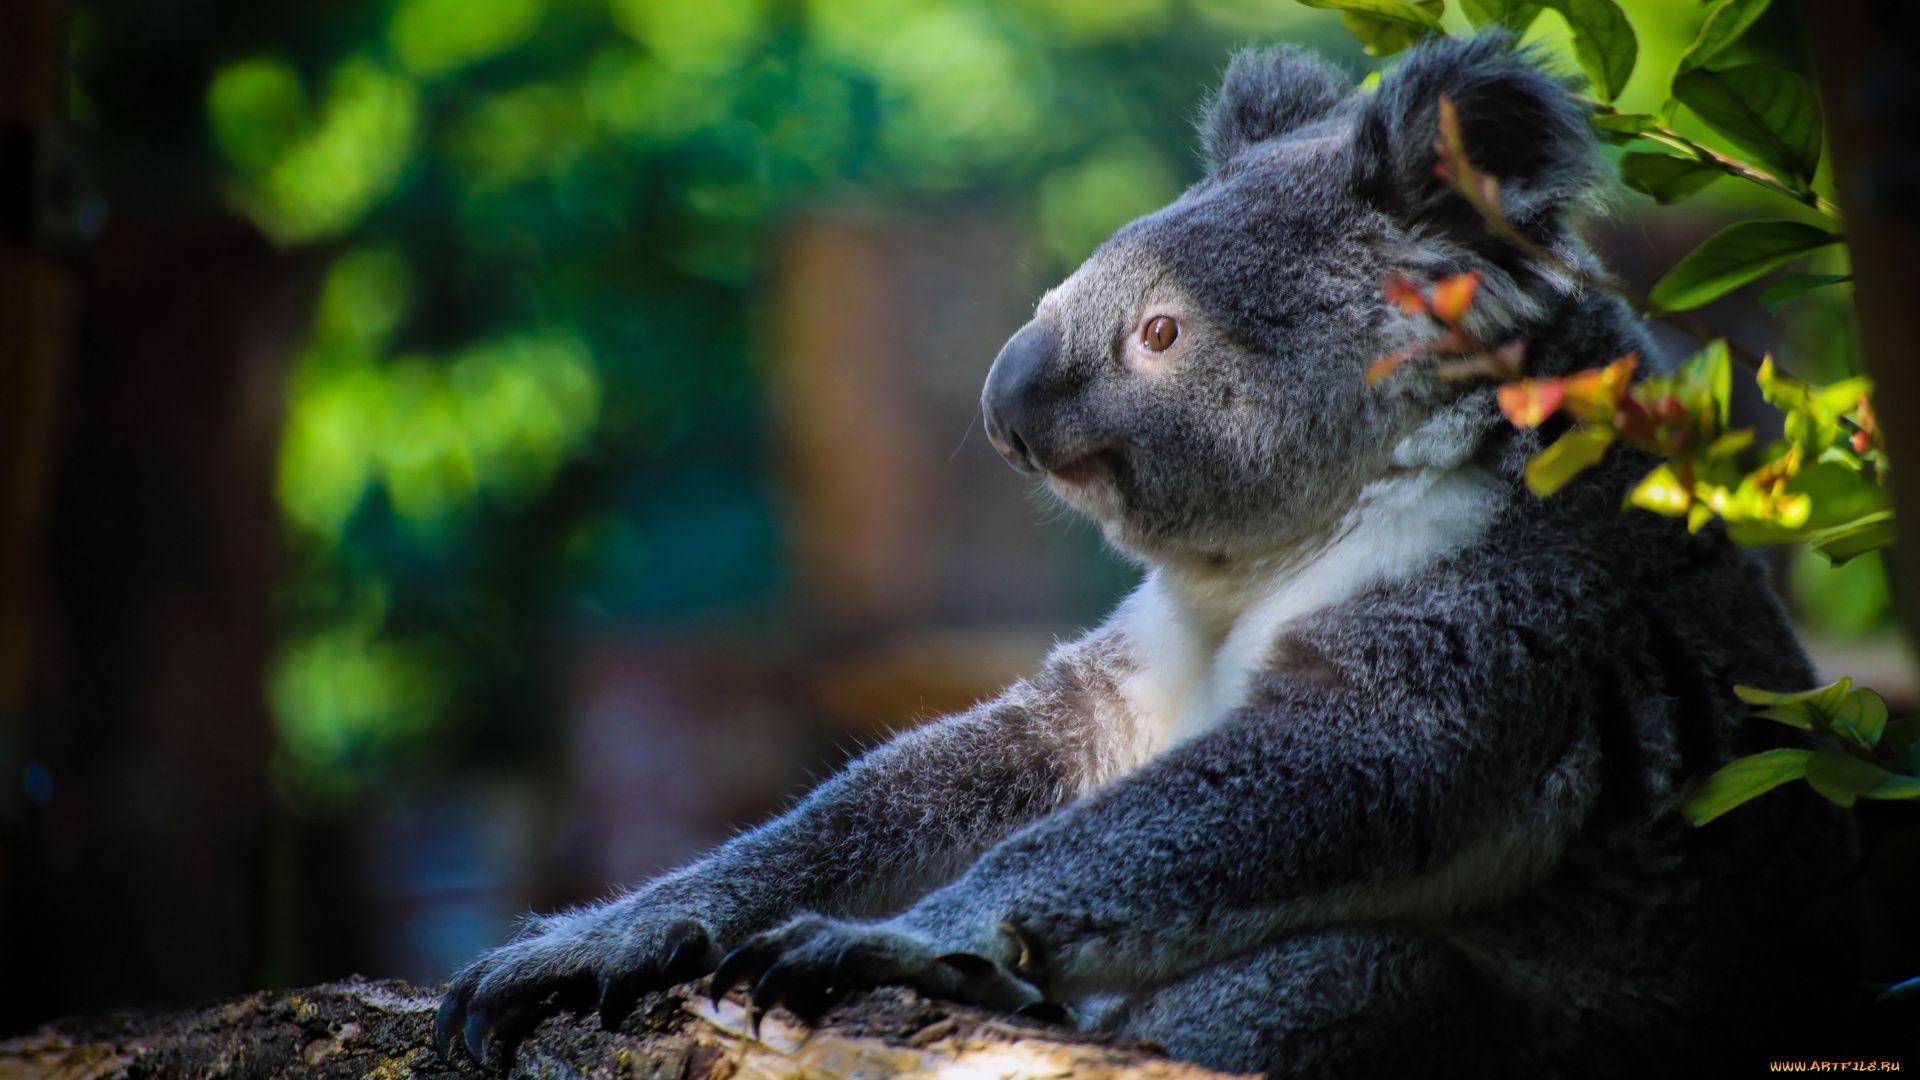 Koala Bear On Your Desktop